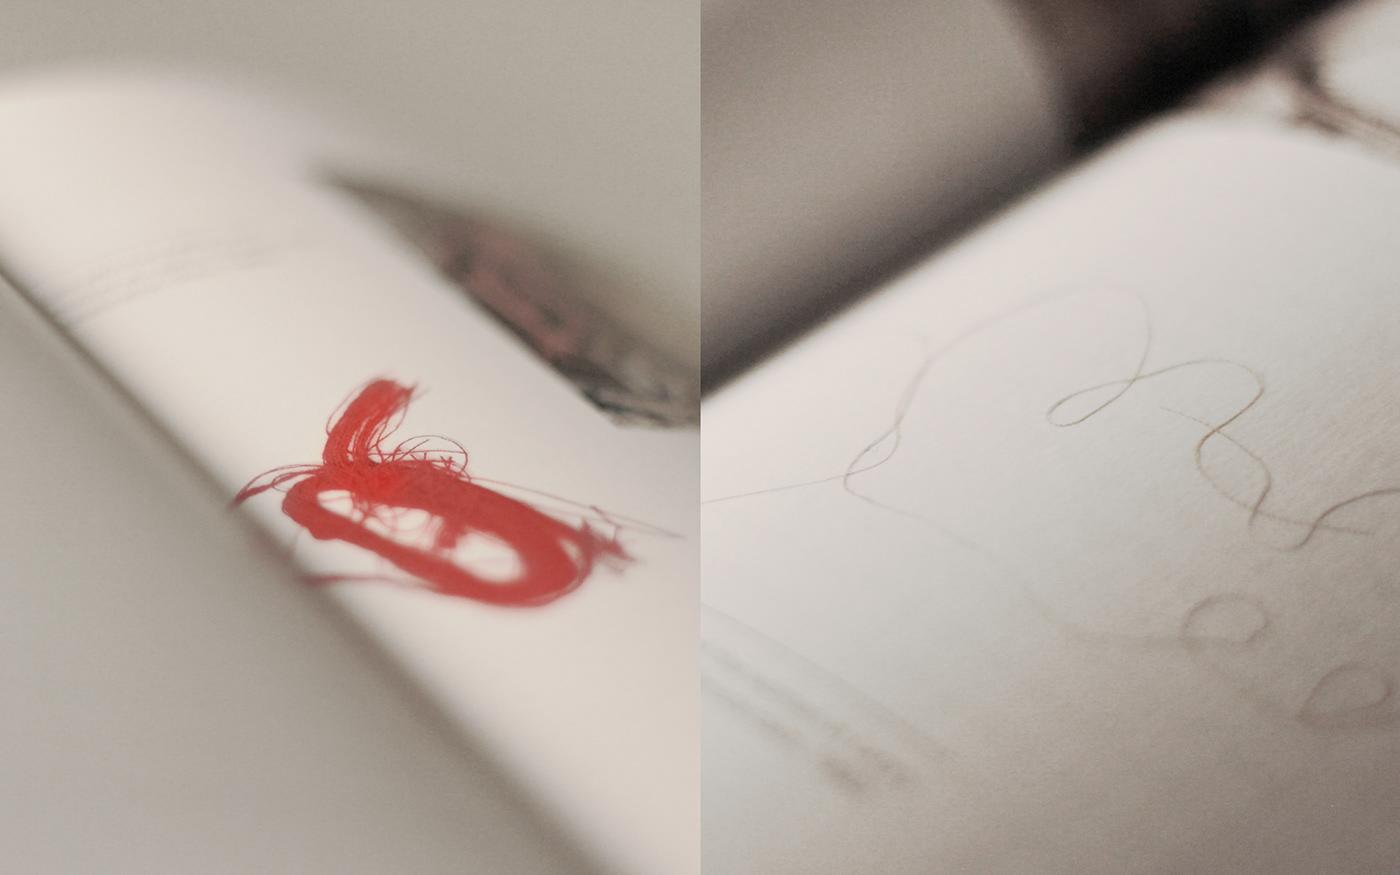 Image may contain: handwriting, drawing and indoor